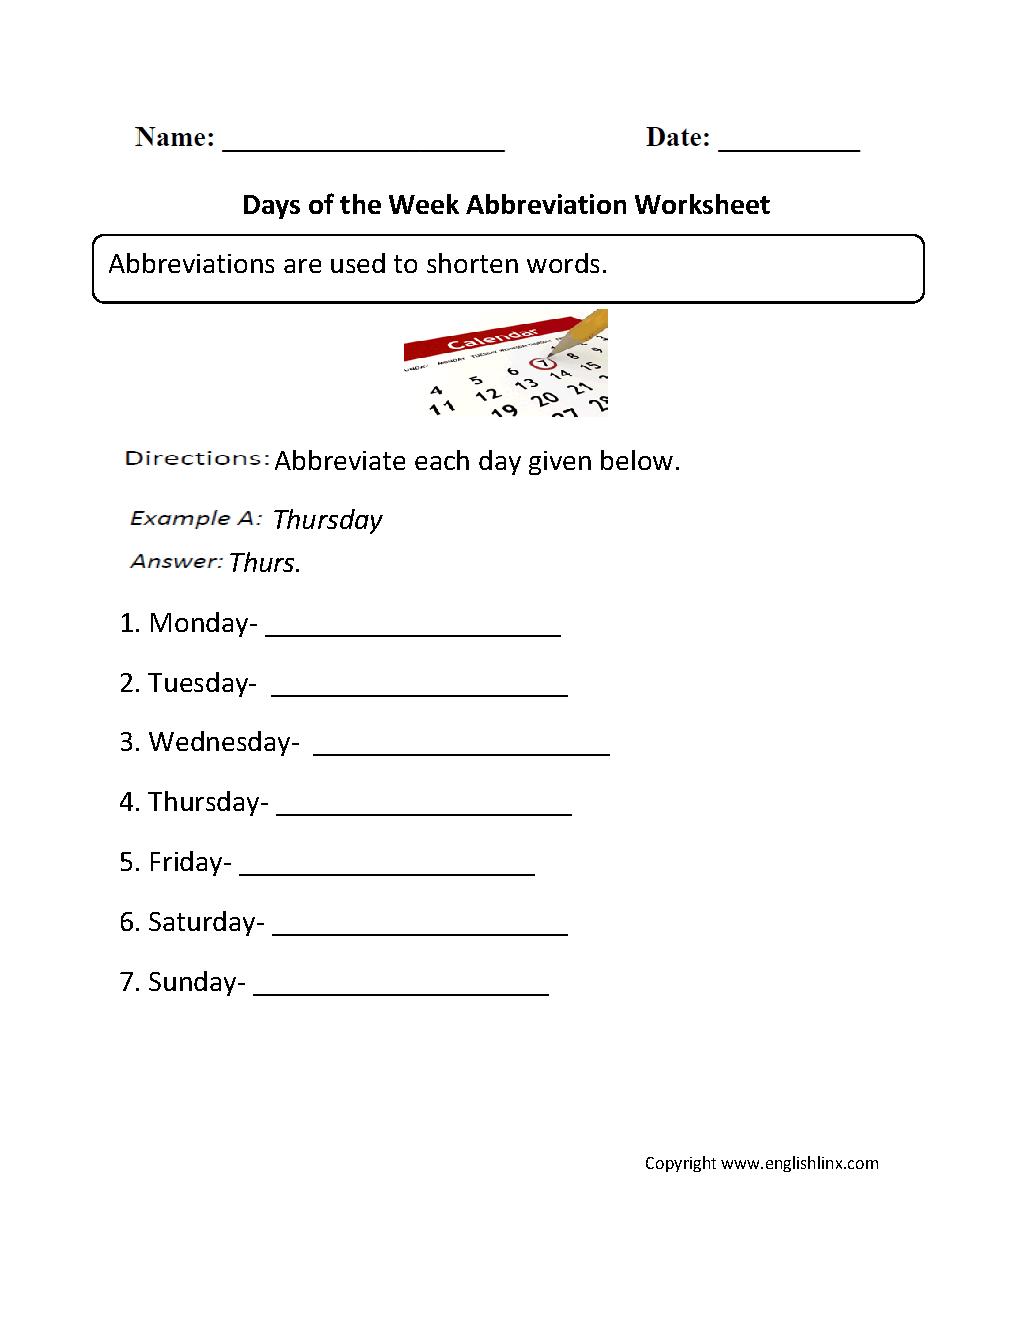 Grammar Mechanics Worksheets | Abbreviation Worksheets | Free Printable Abbreviation Worksheets